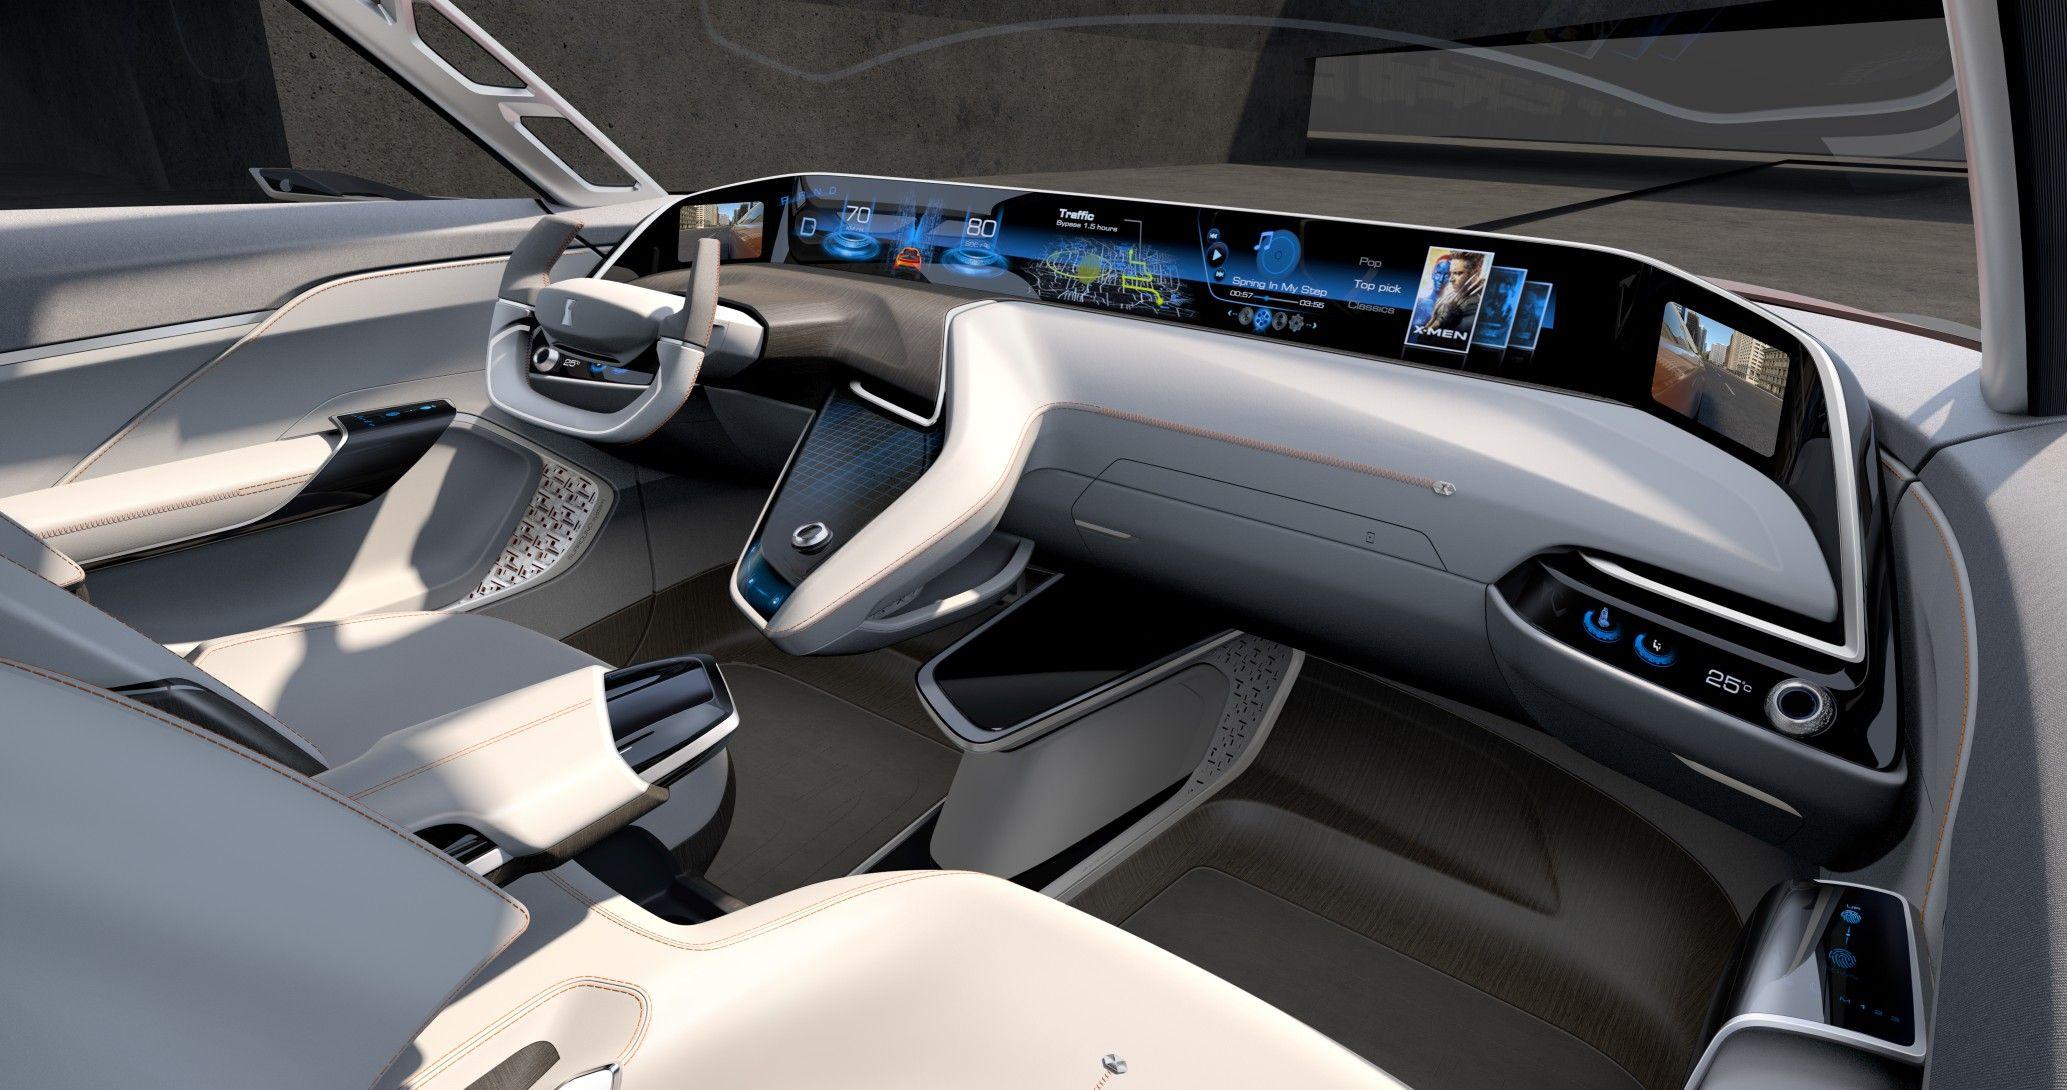 Pin By Cheney Che On Oleksiy Tsapliy Lead Interior Designer Futuristic Cars Interior Car Interior Design Sketch Car Interior Sketch